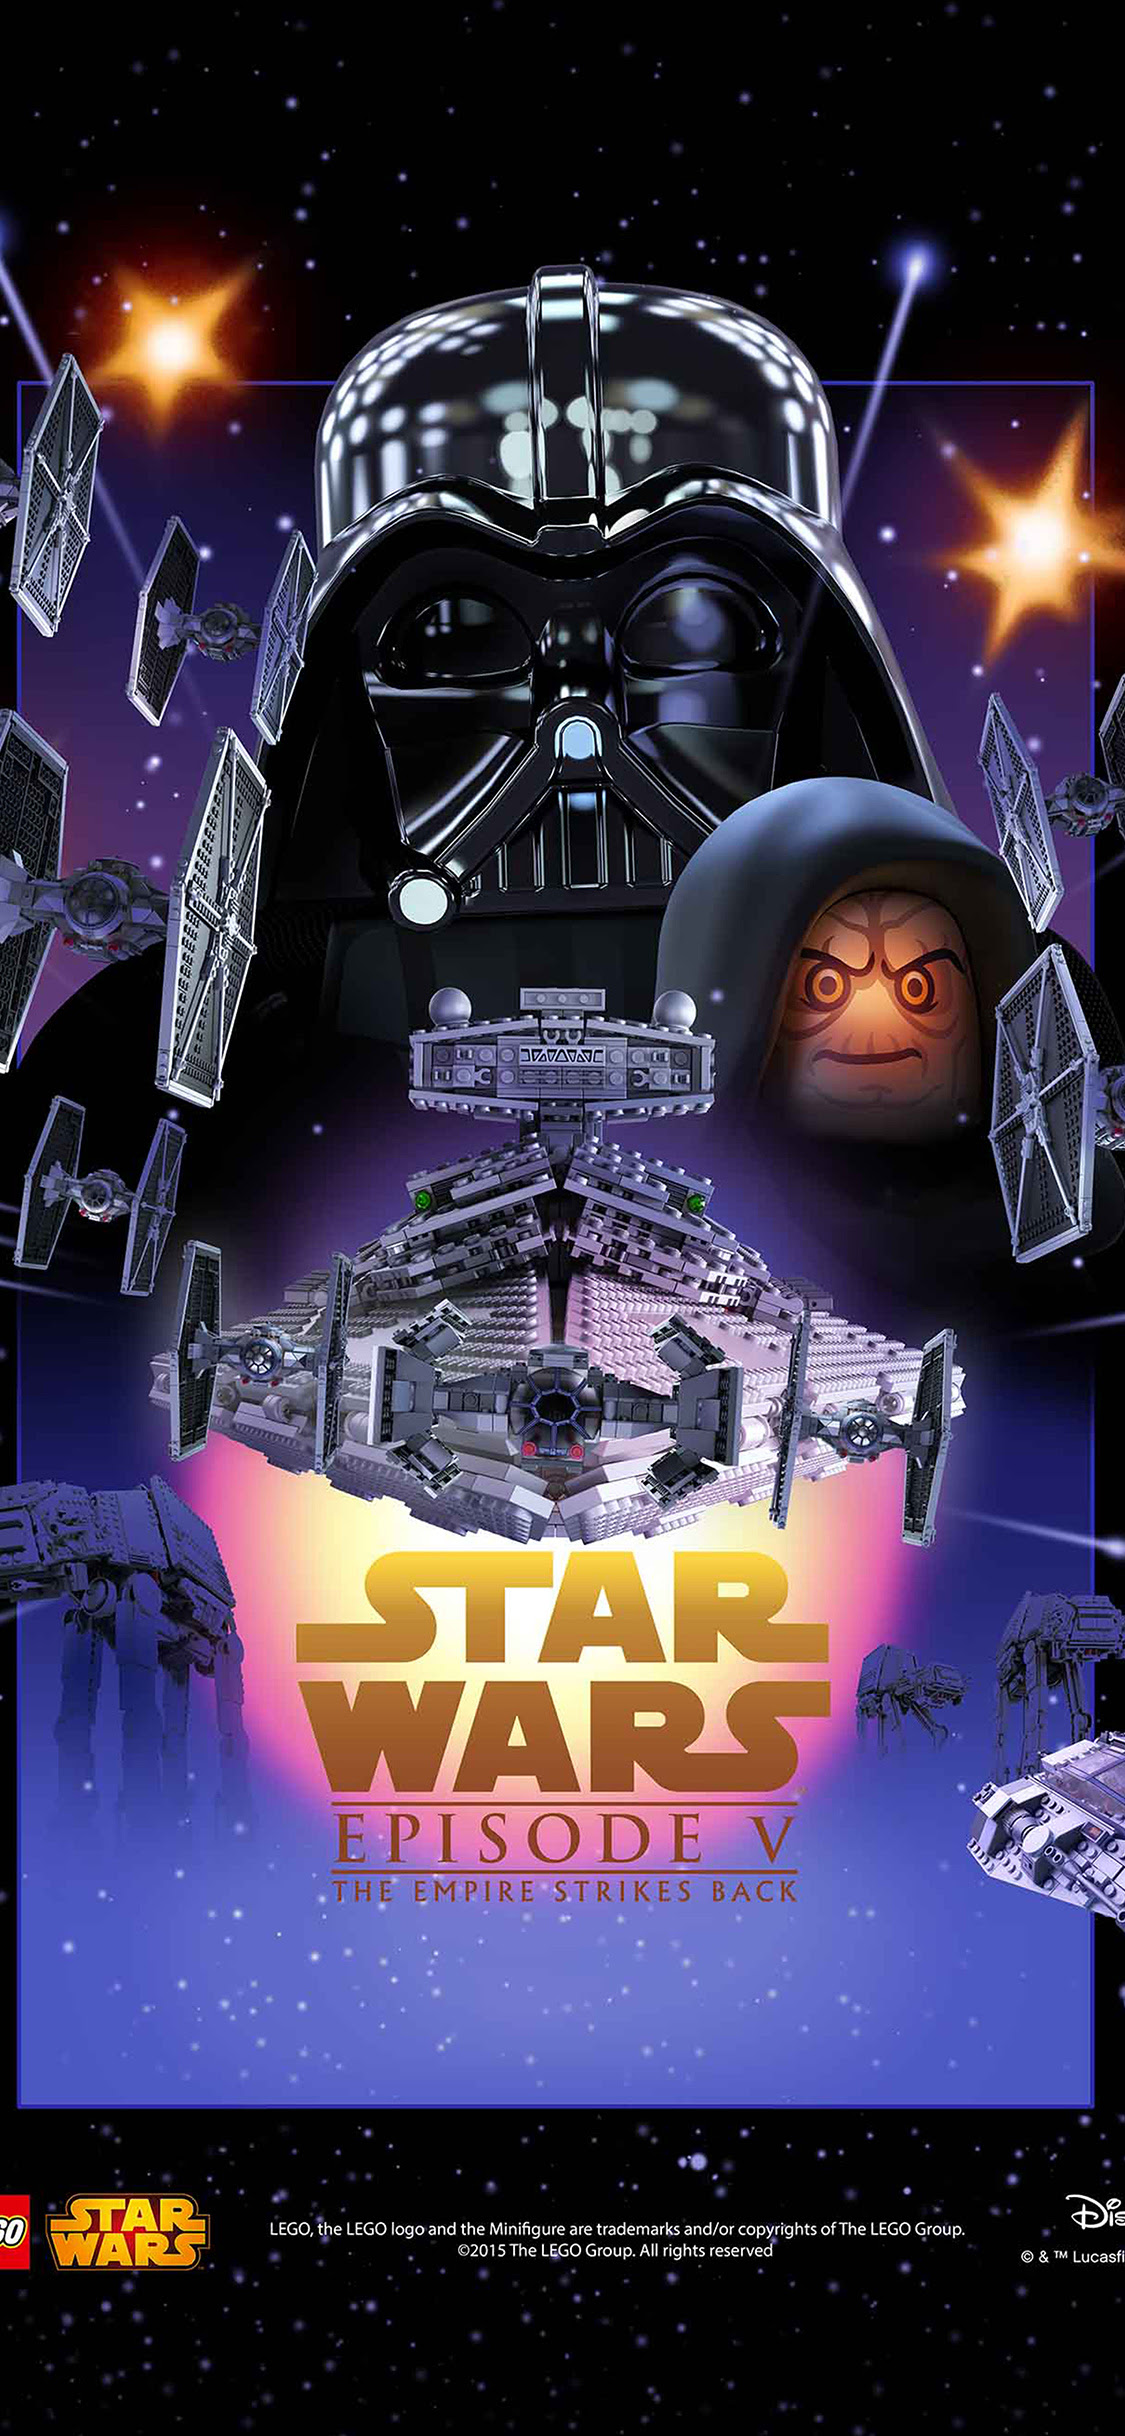 Iphone11papers Com Iphone11 Wallpaper Ap23 Starwars Lego Episode 5 Empire Strikes Back Film Art